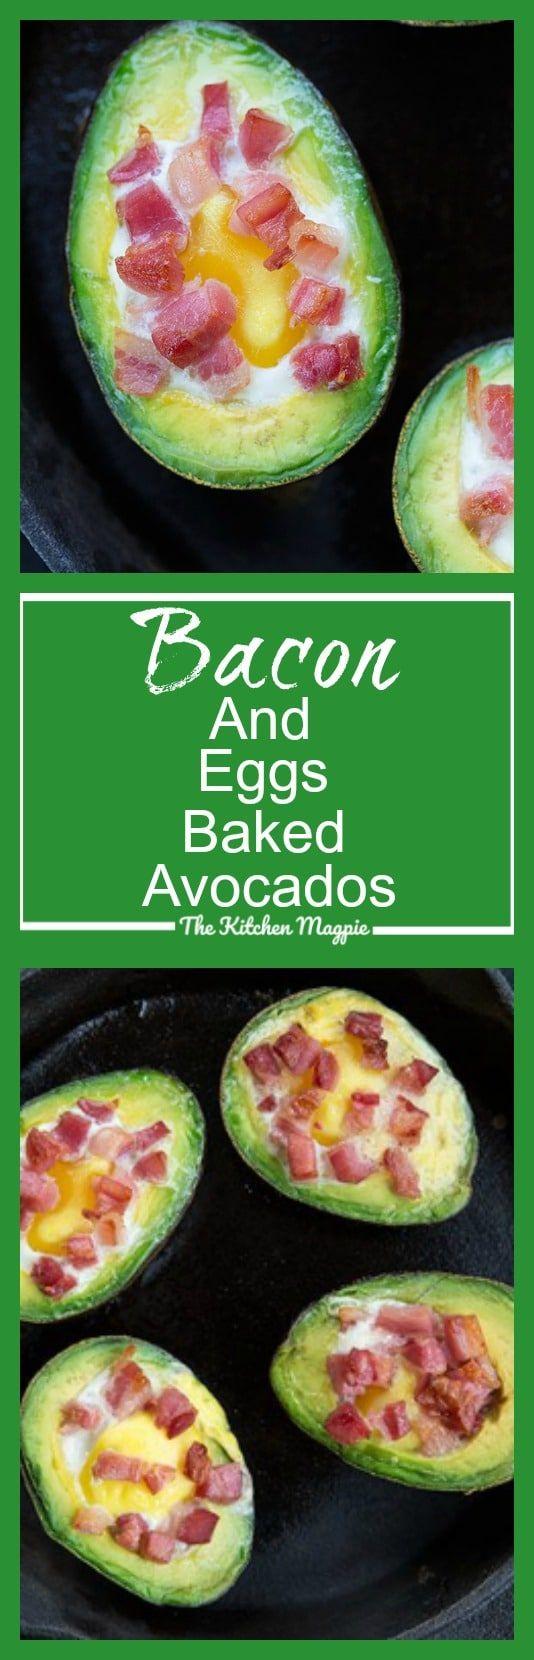 Bacon & Eggs Baked Avocado - The Kitchen Magpie